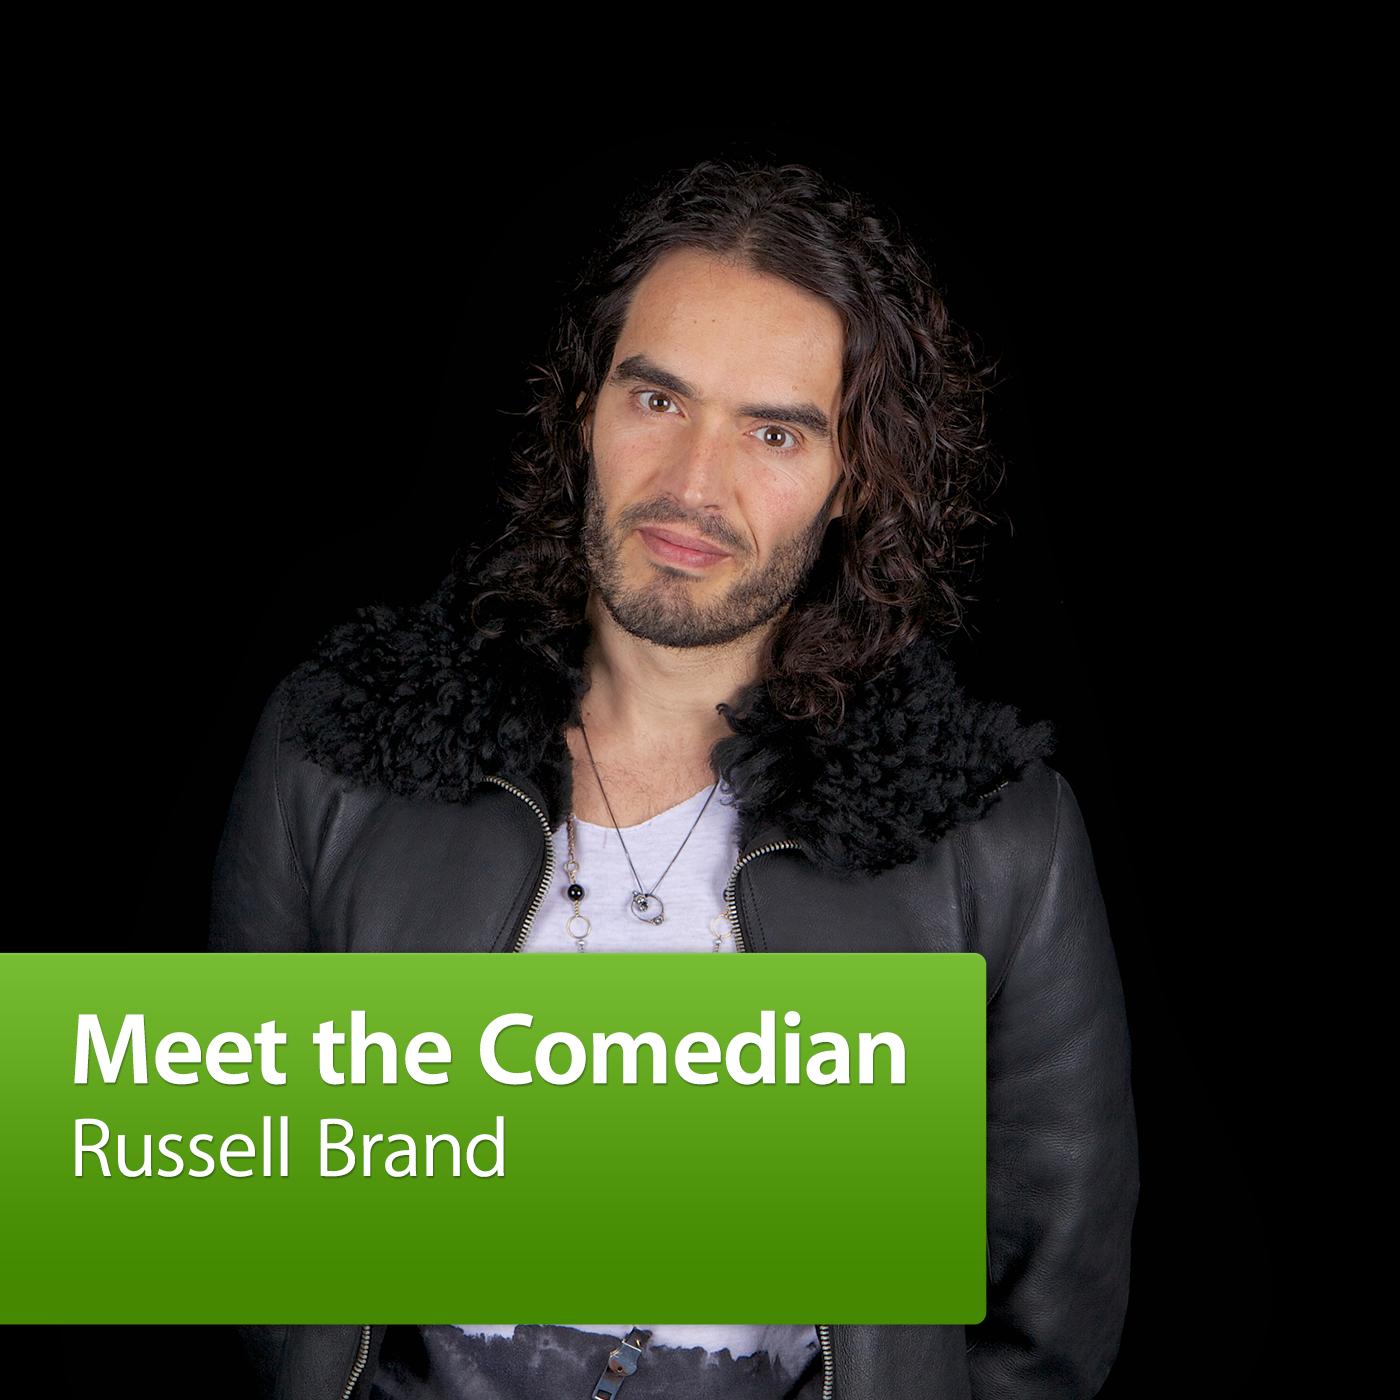 Russell Brand: Meet the Comedian